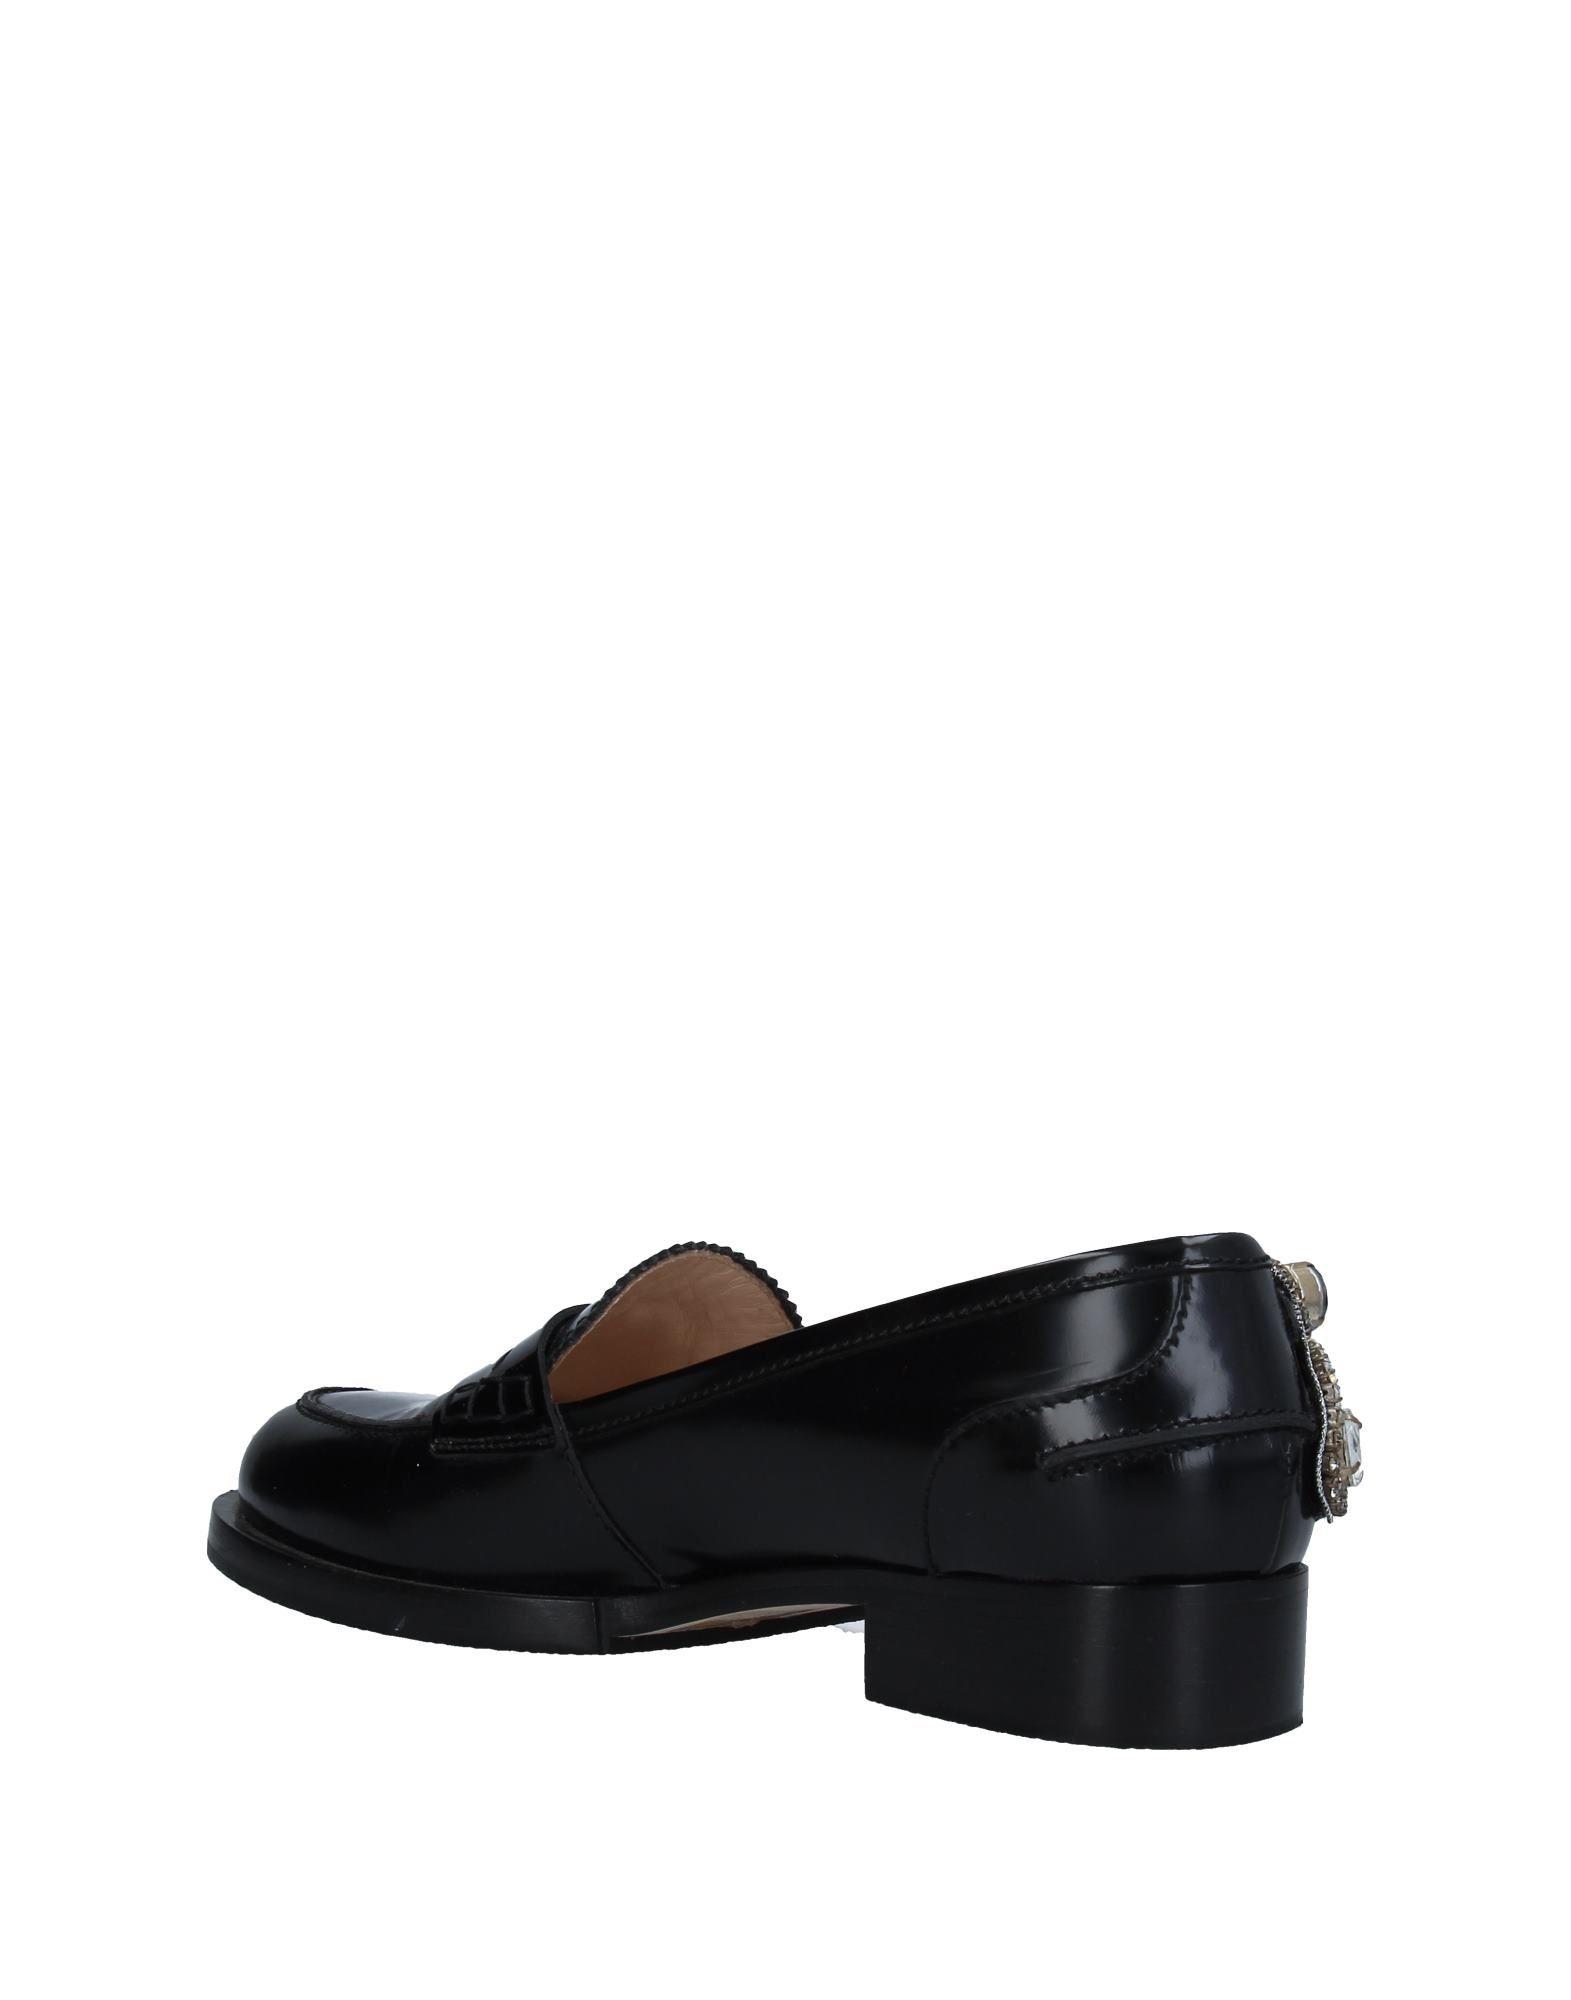 N° Mokassins 21 Mokassins N° Damen  11360870EF Beliebte Schuhe eeec10